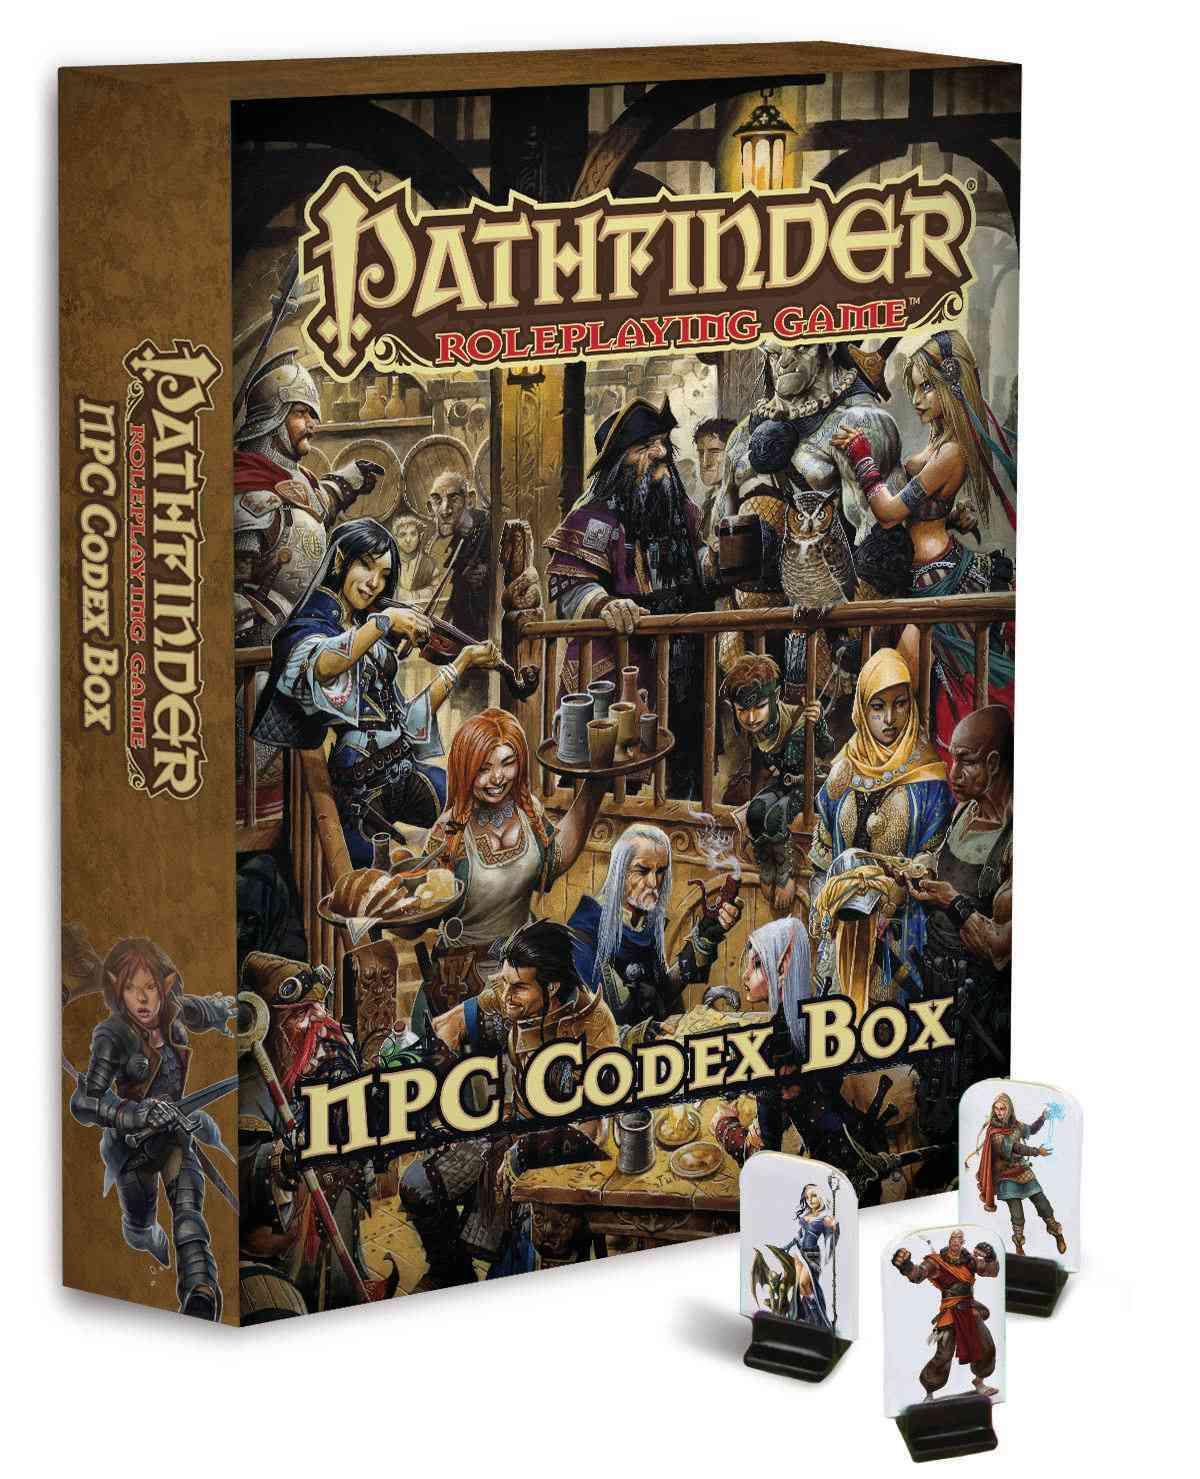 NPC Codex Box (Game)